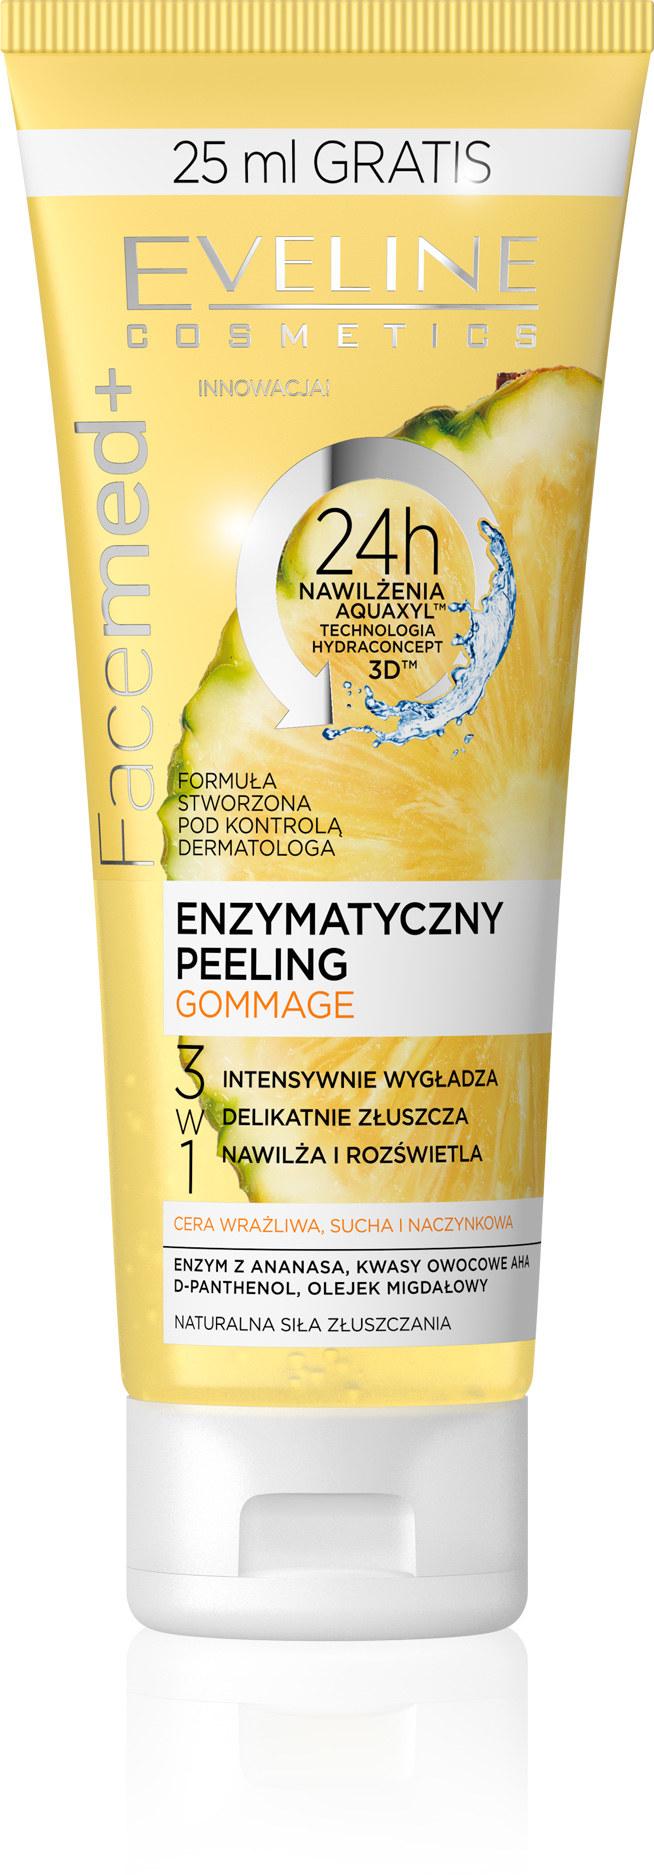 Peeling gommage od Eveline Cosmetics /INTERIA.PL/materiały prasowe